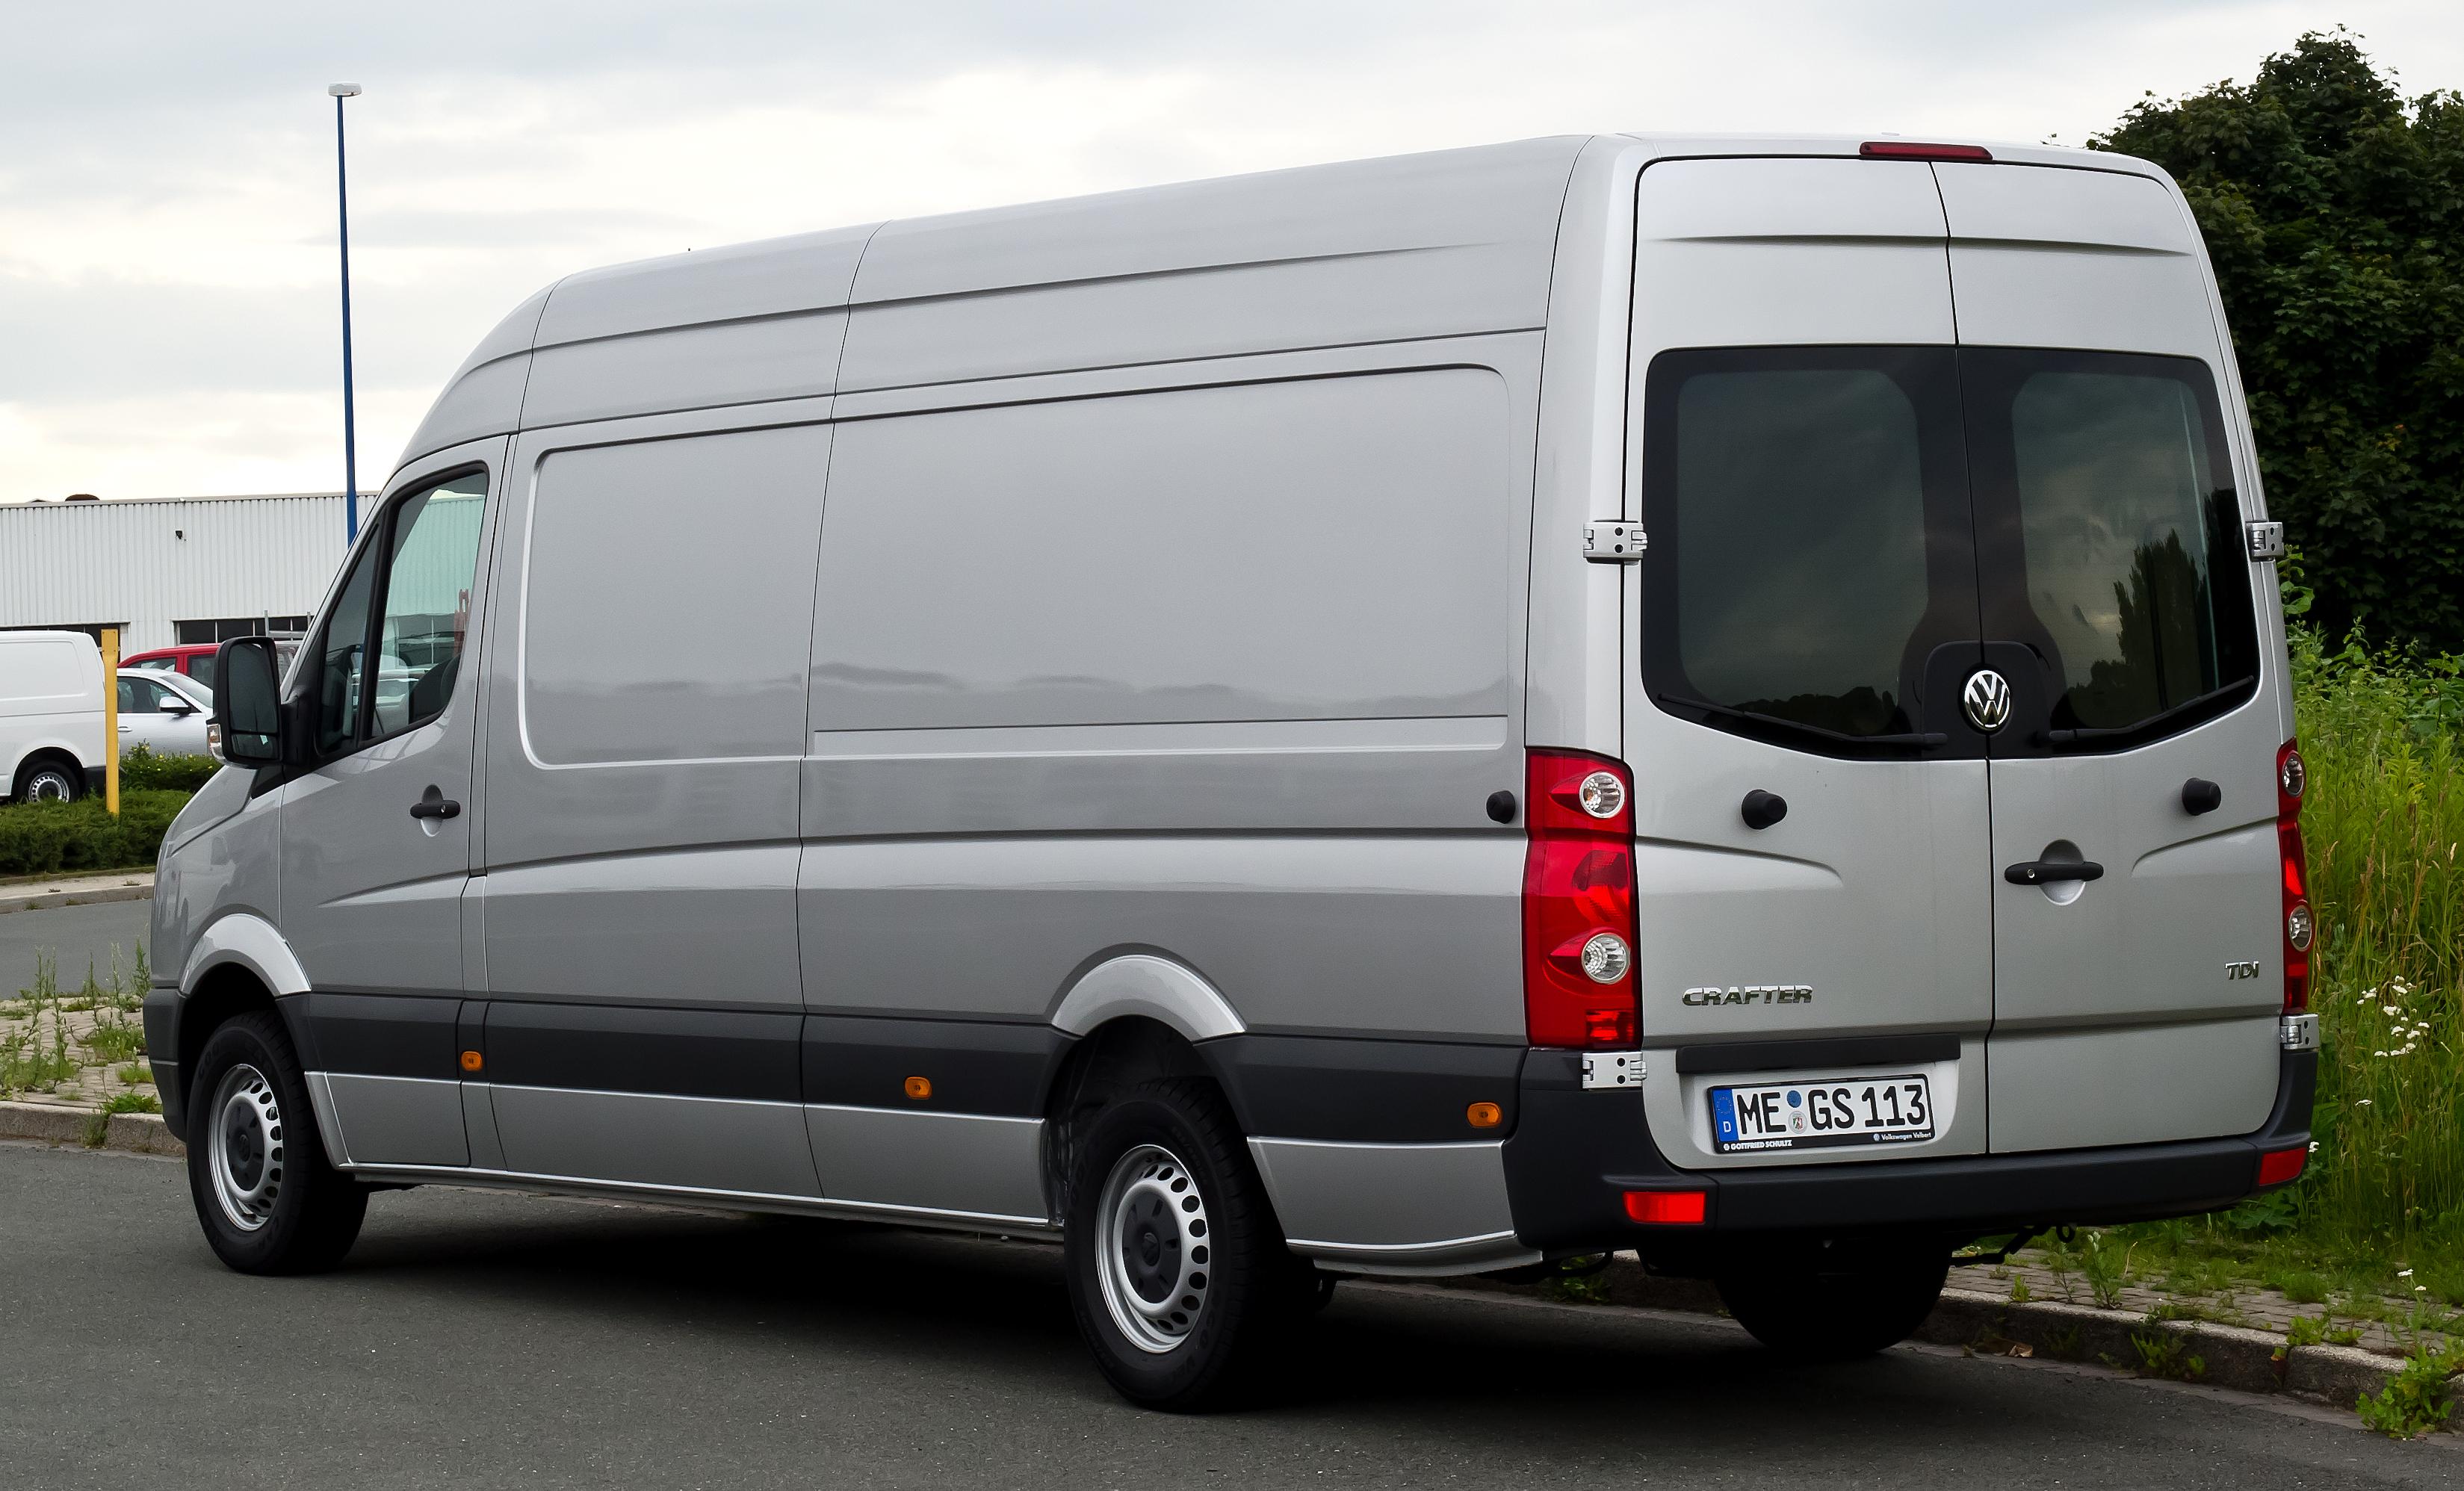 Mercedes Sprinter Wiki >> File:VW Crafter 2.0 TDI (Facelift) – Heckansicht, 9. Juli ...